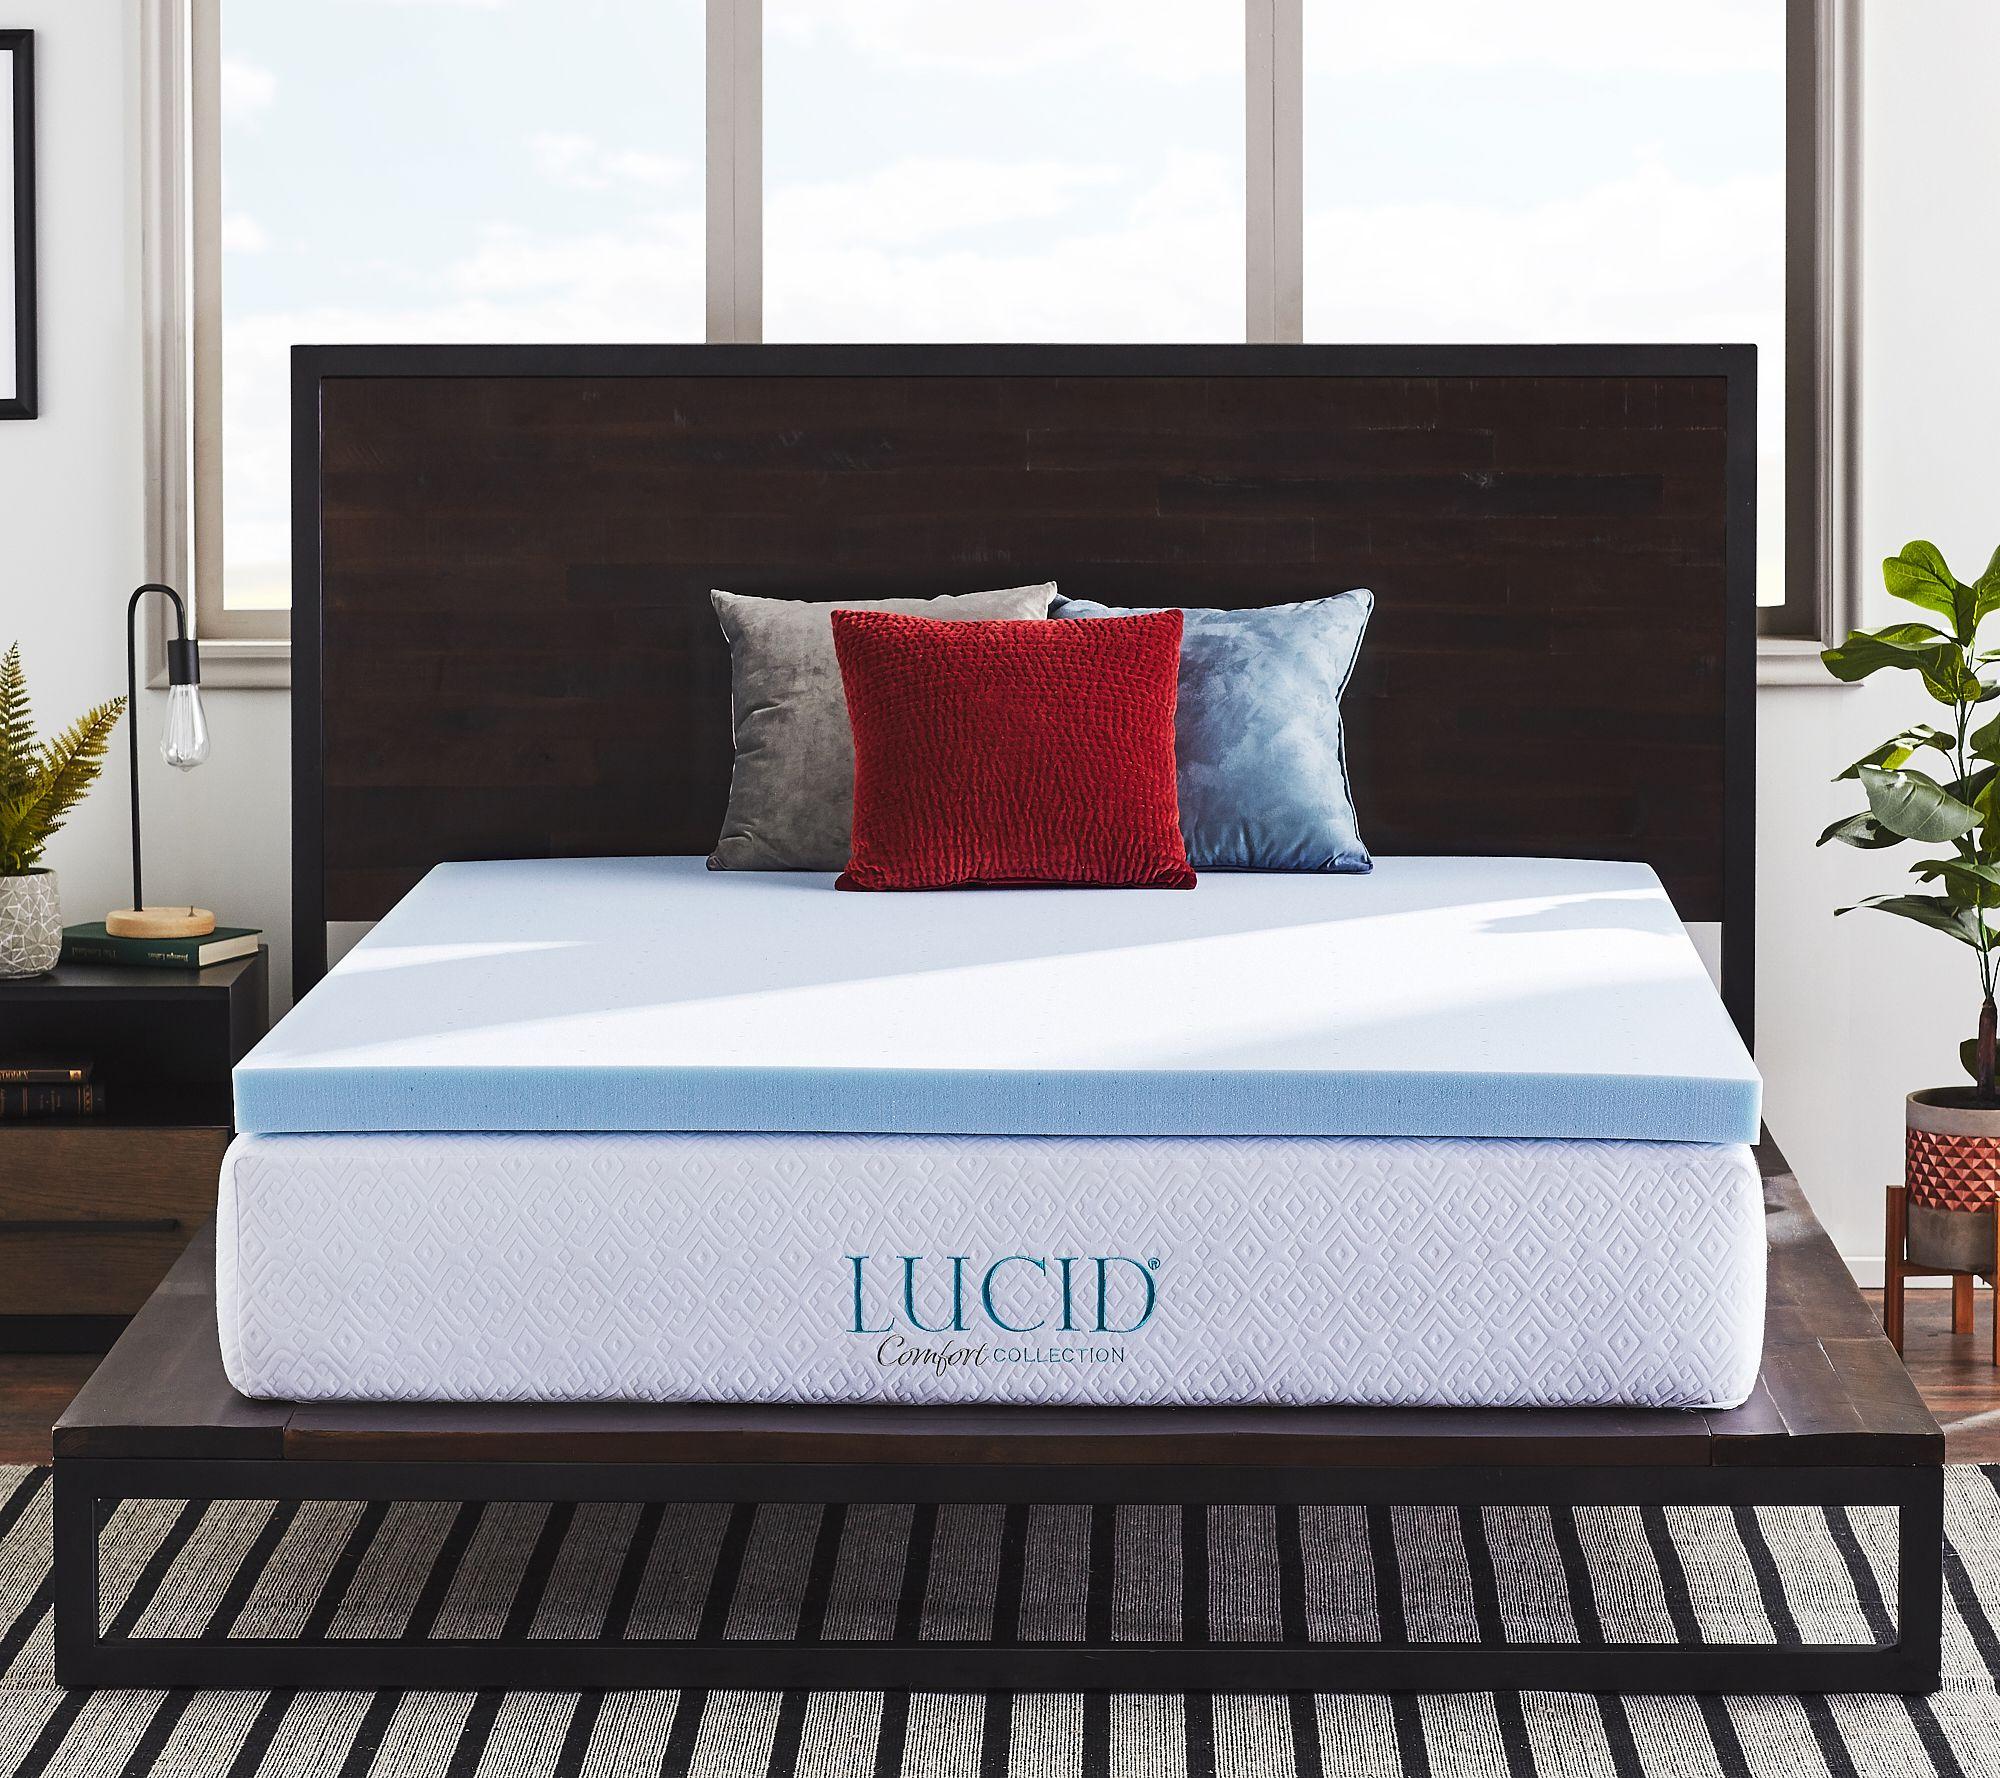 Lucid 2-inch 5-Zone Lavender Plush Memory Foam Mattress Topper Twin Full Queen K